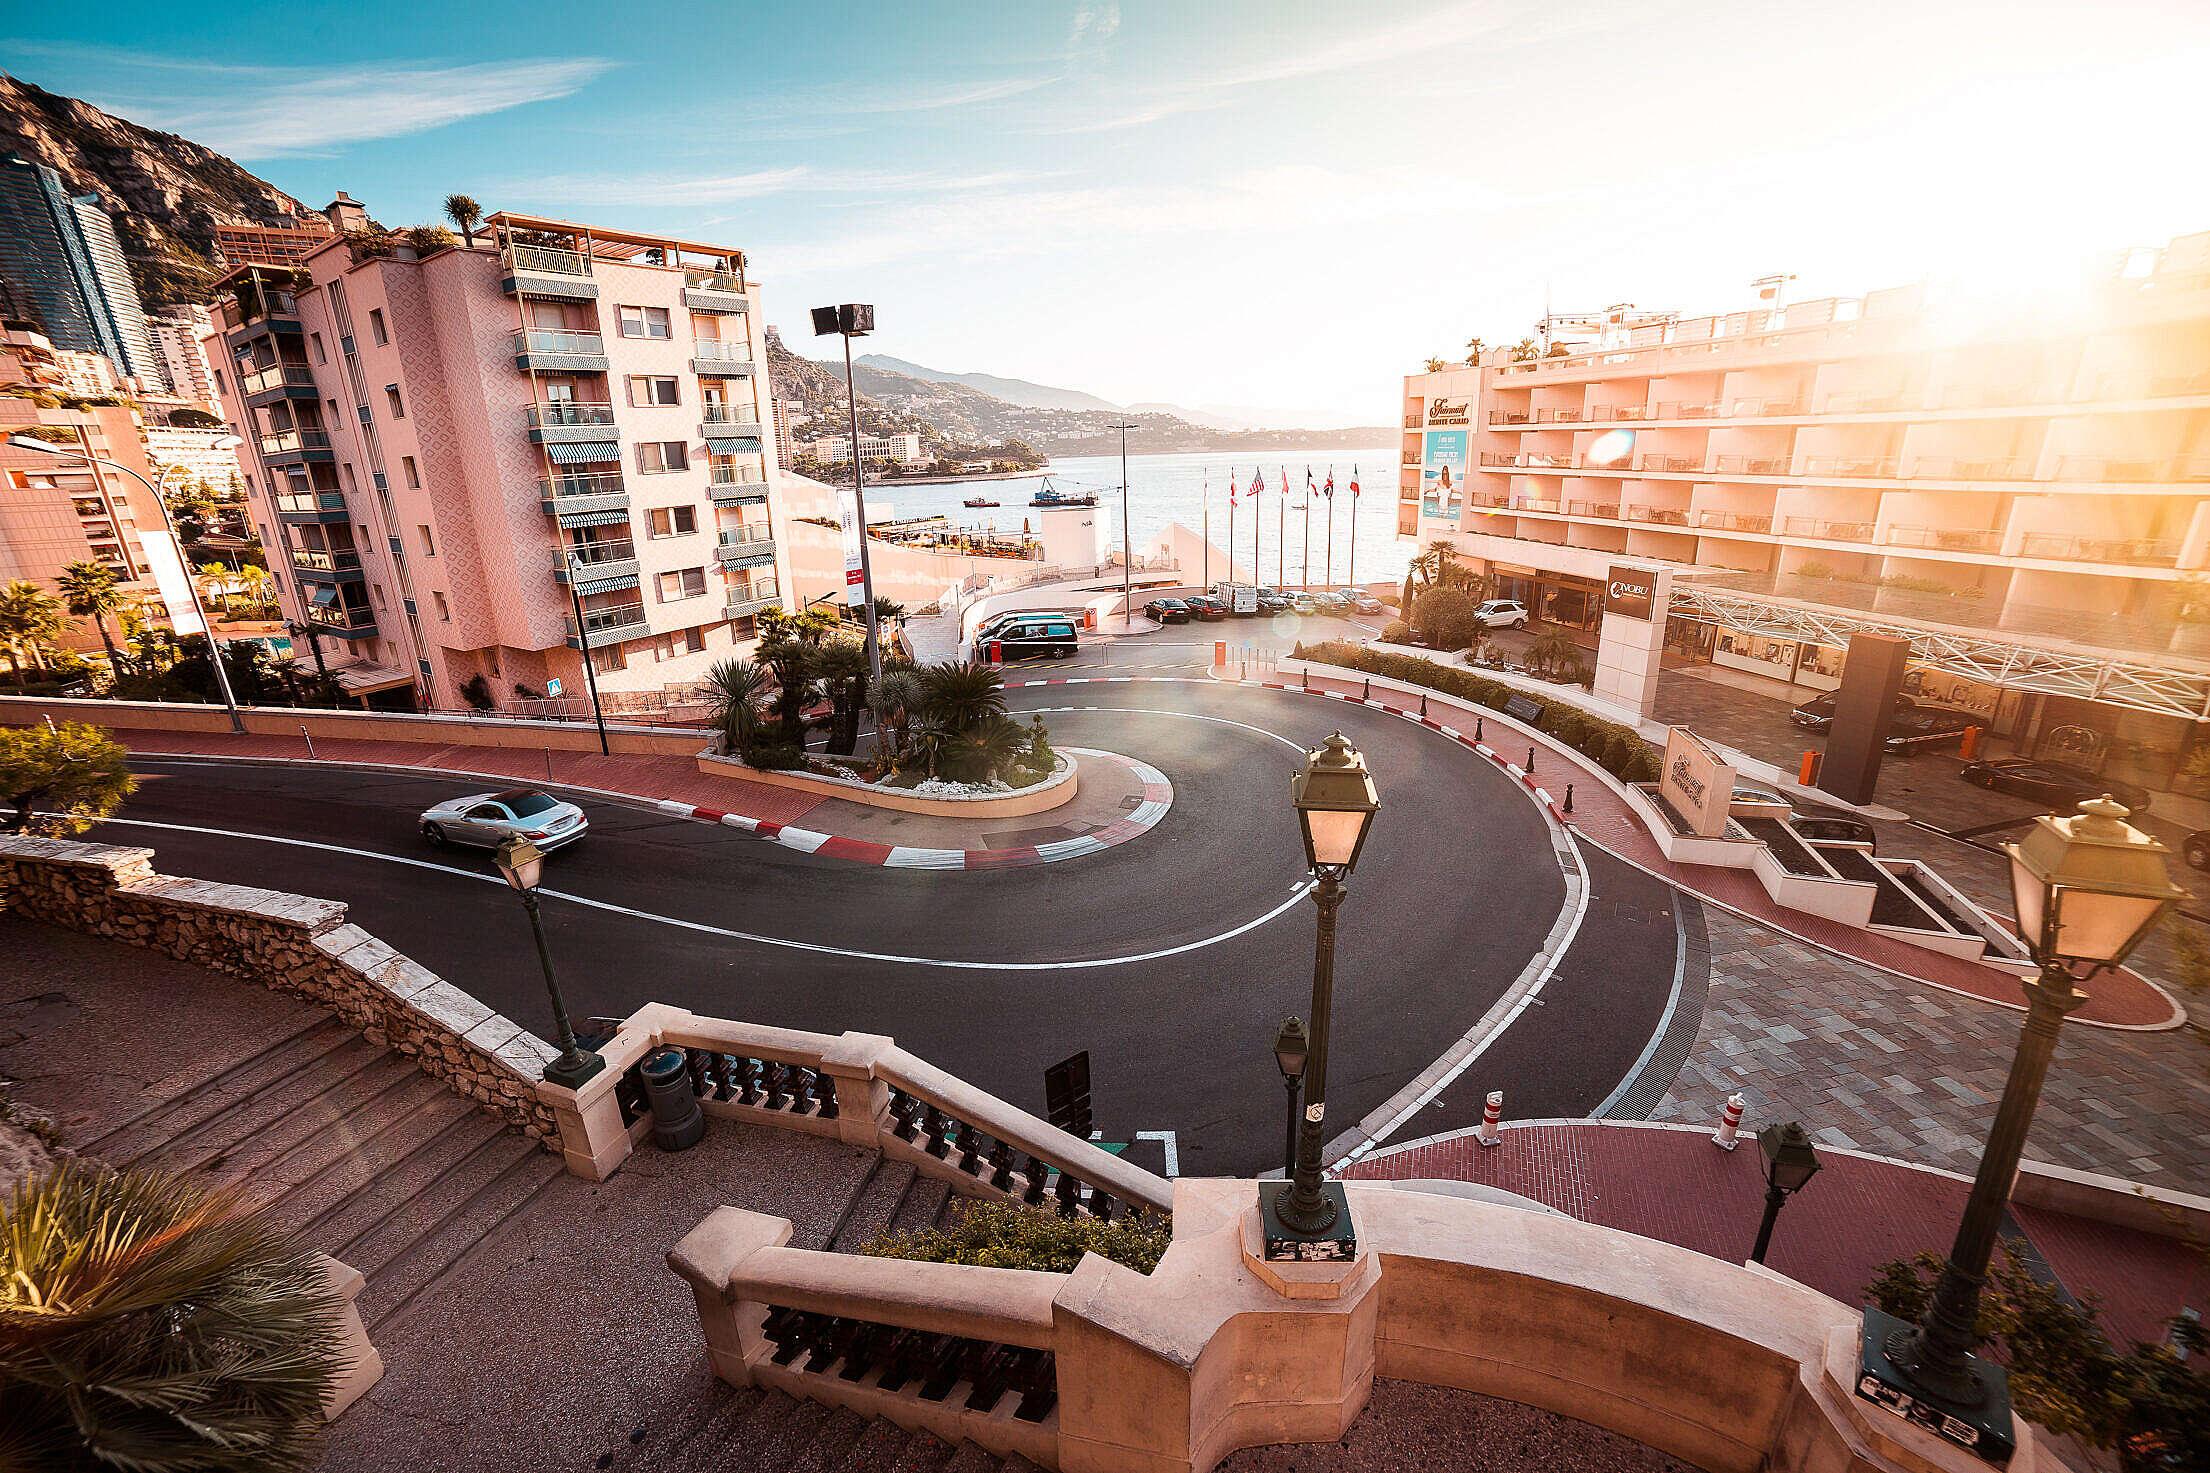 Monte-Carlo F1 Monaco Hairpin Free Stock Photo